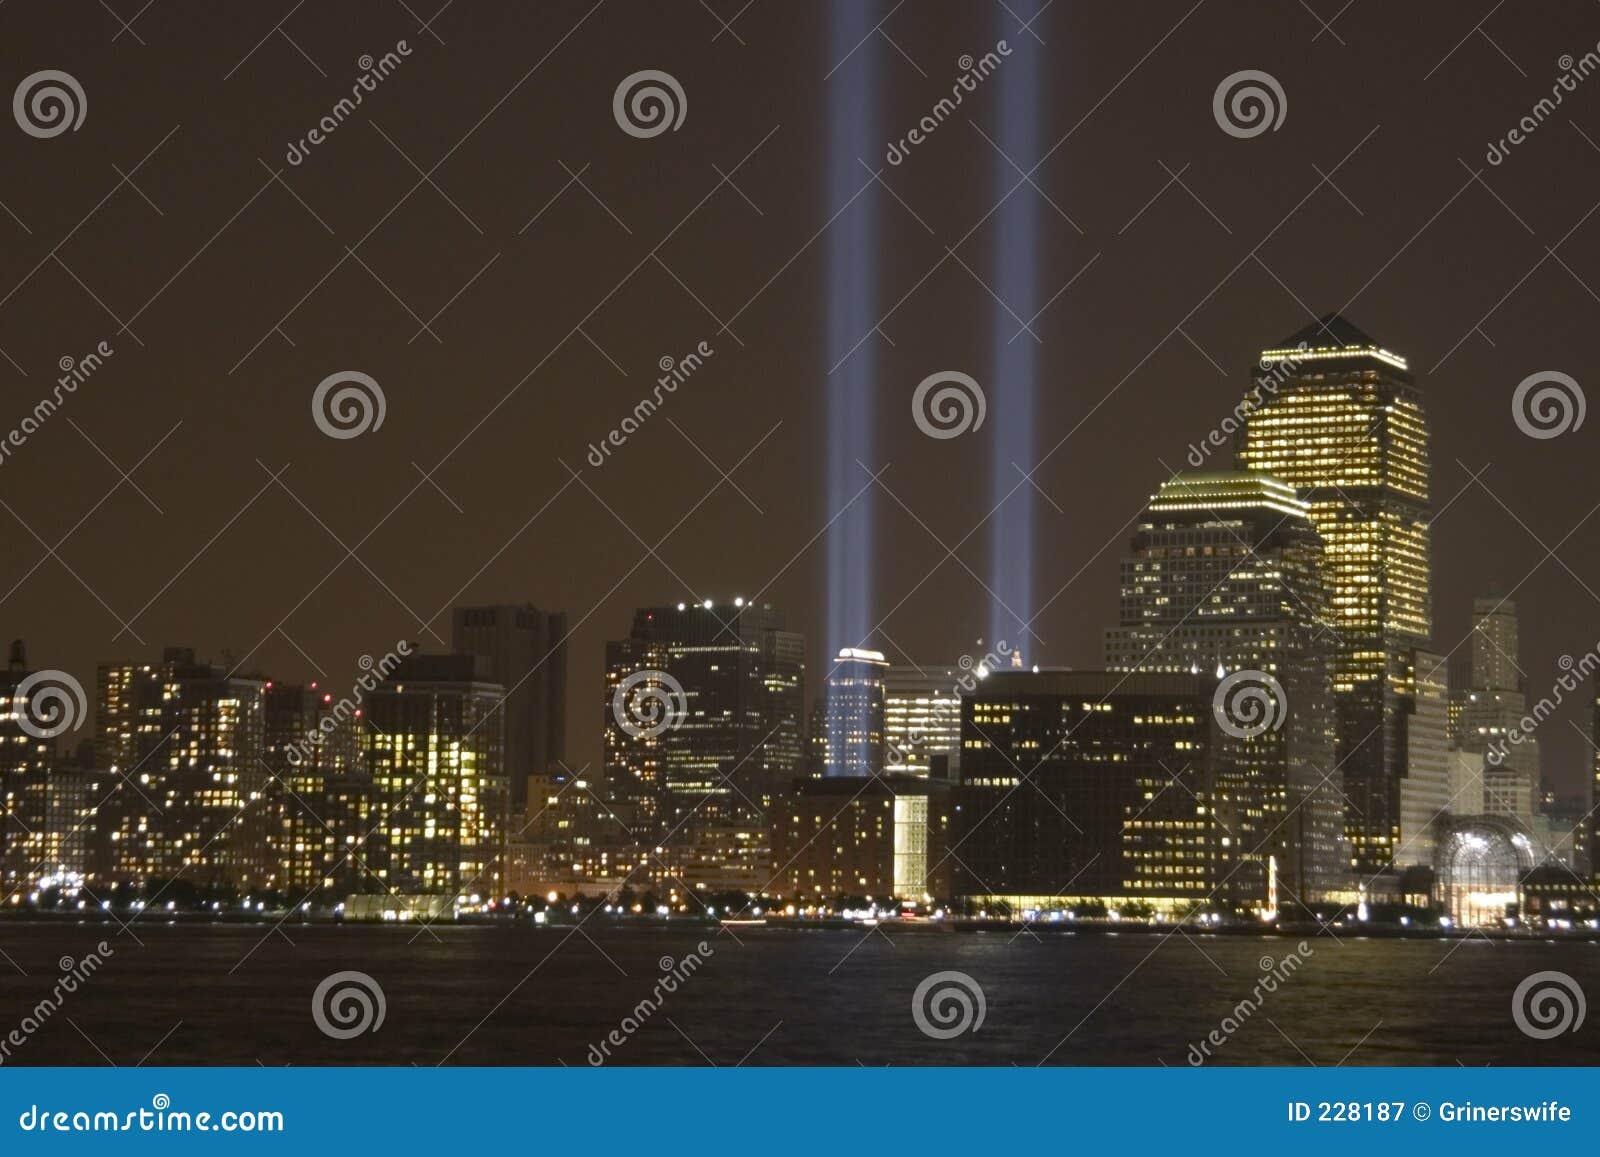 11th 2 memorial september